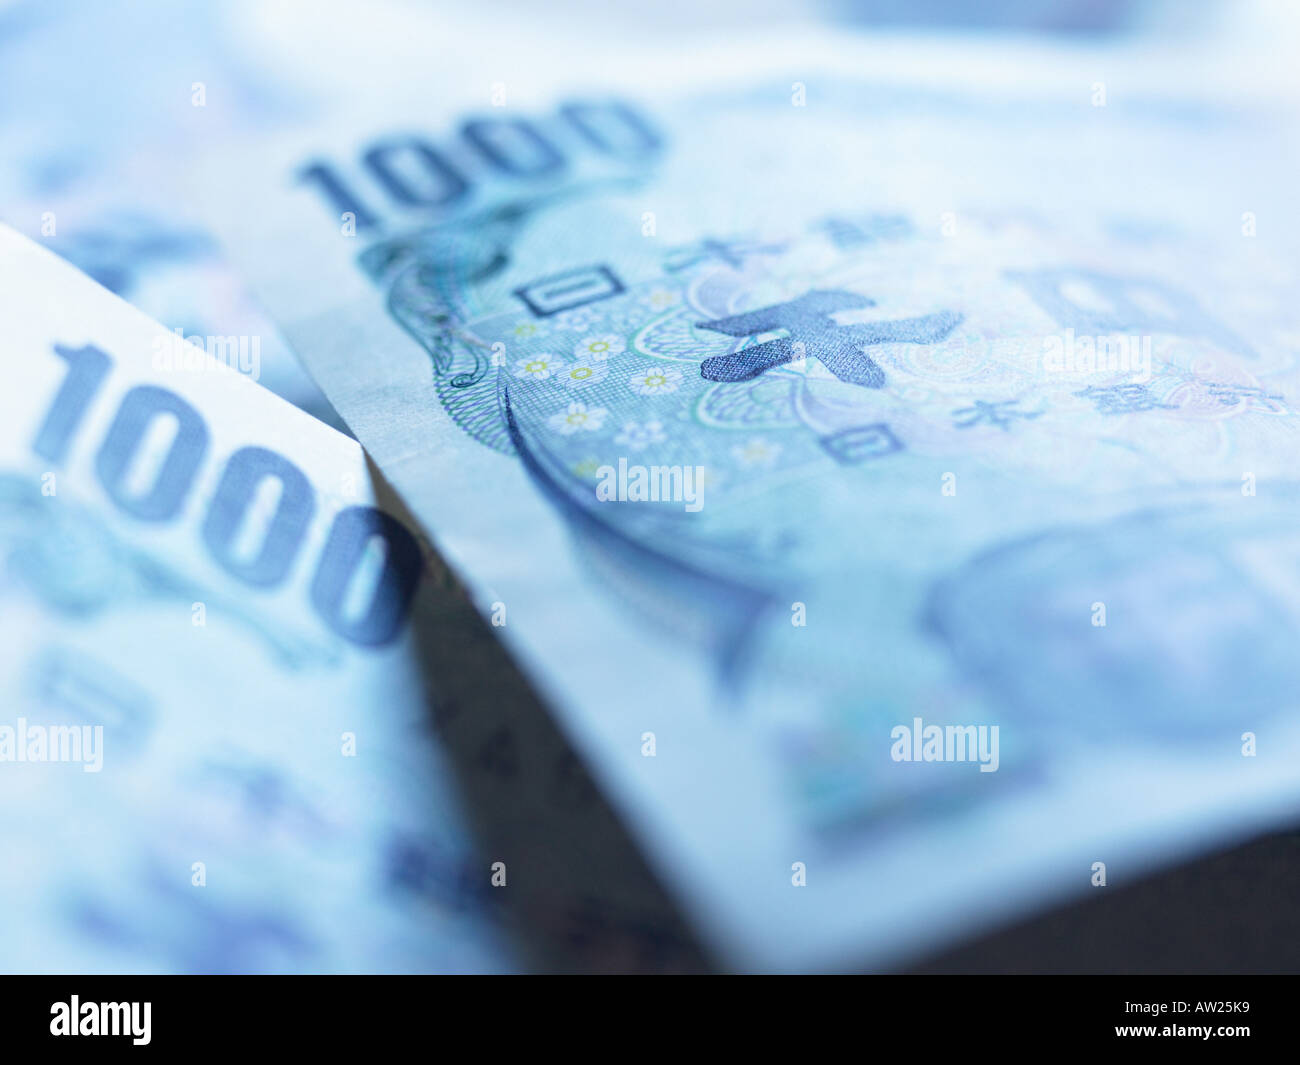 One thousand yen notes - Stock Image